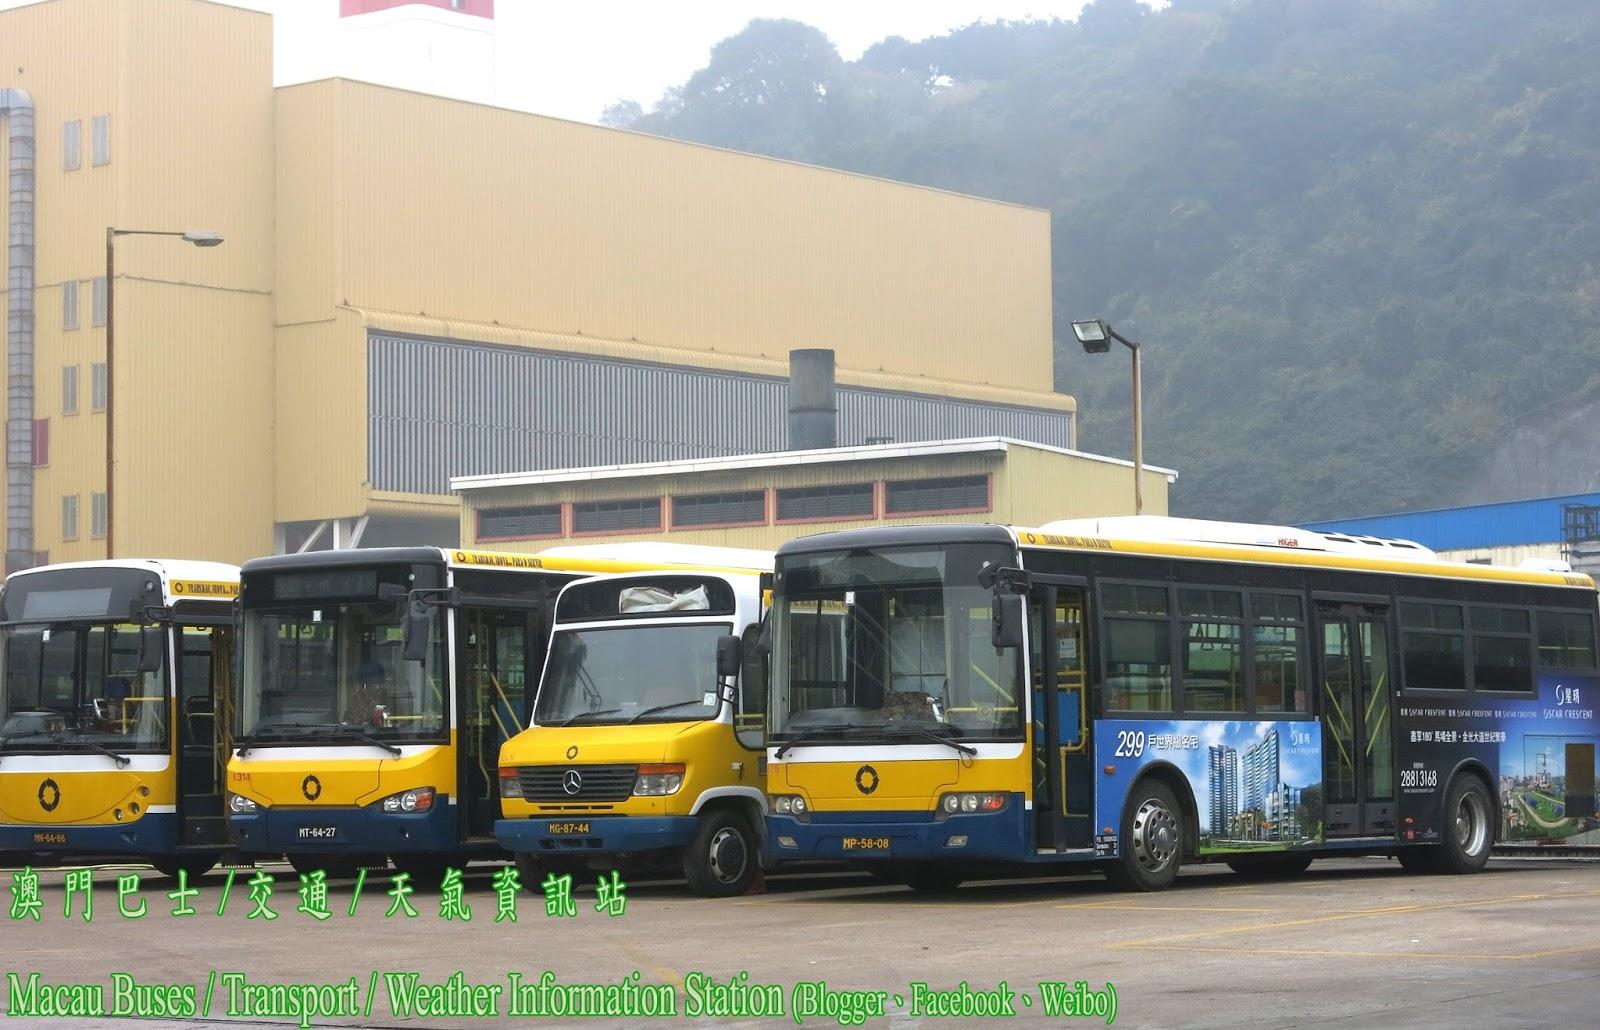 澳 門 巴 士 / 交 通 / 天 氣 資 訊 站 Macau Buses / Transport / Weather Information Station: 新福利重新翻新一部BENZ O814小巴